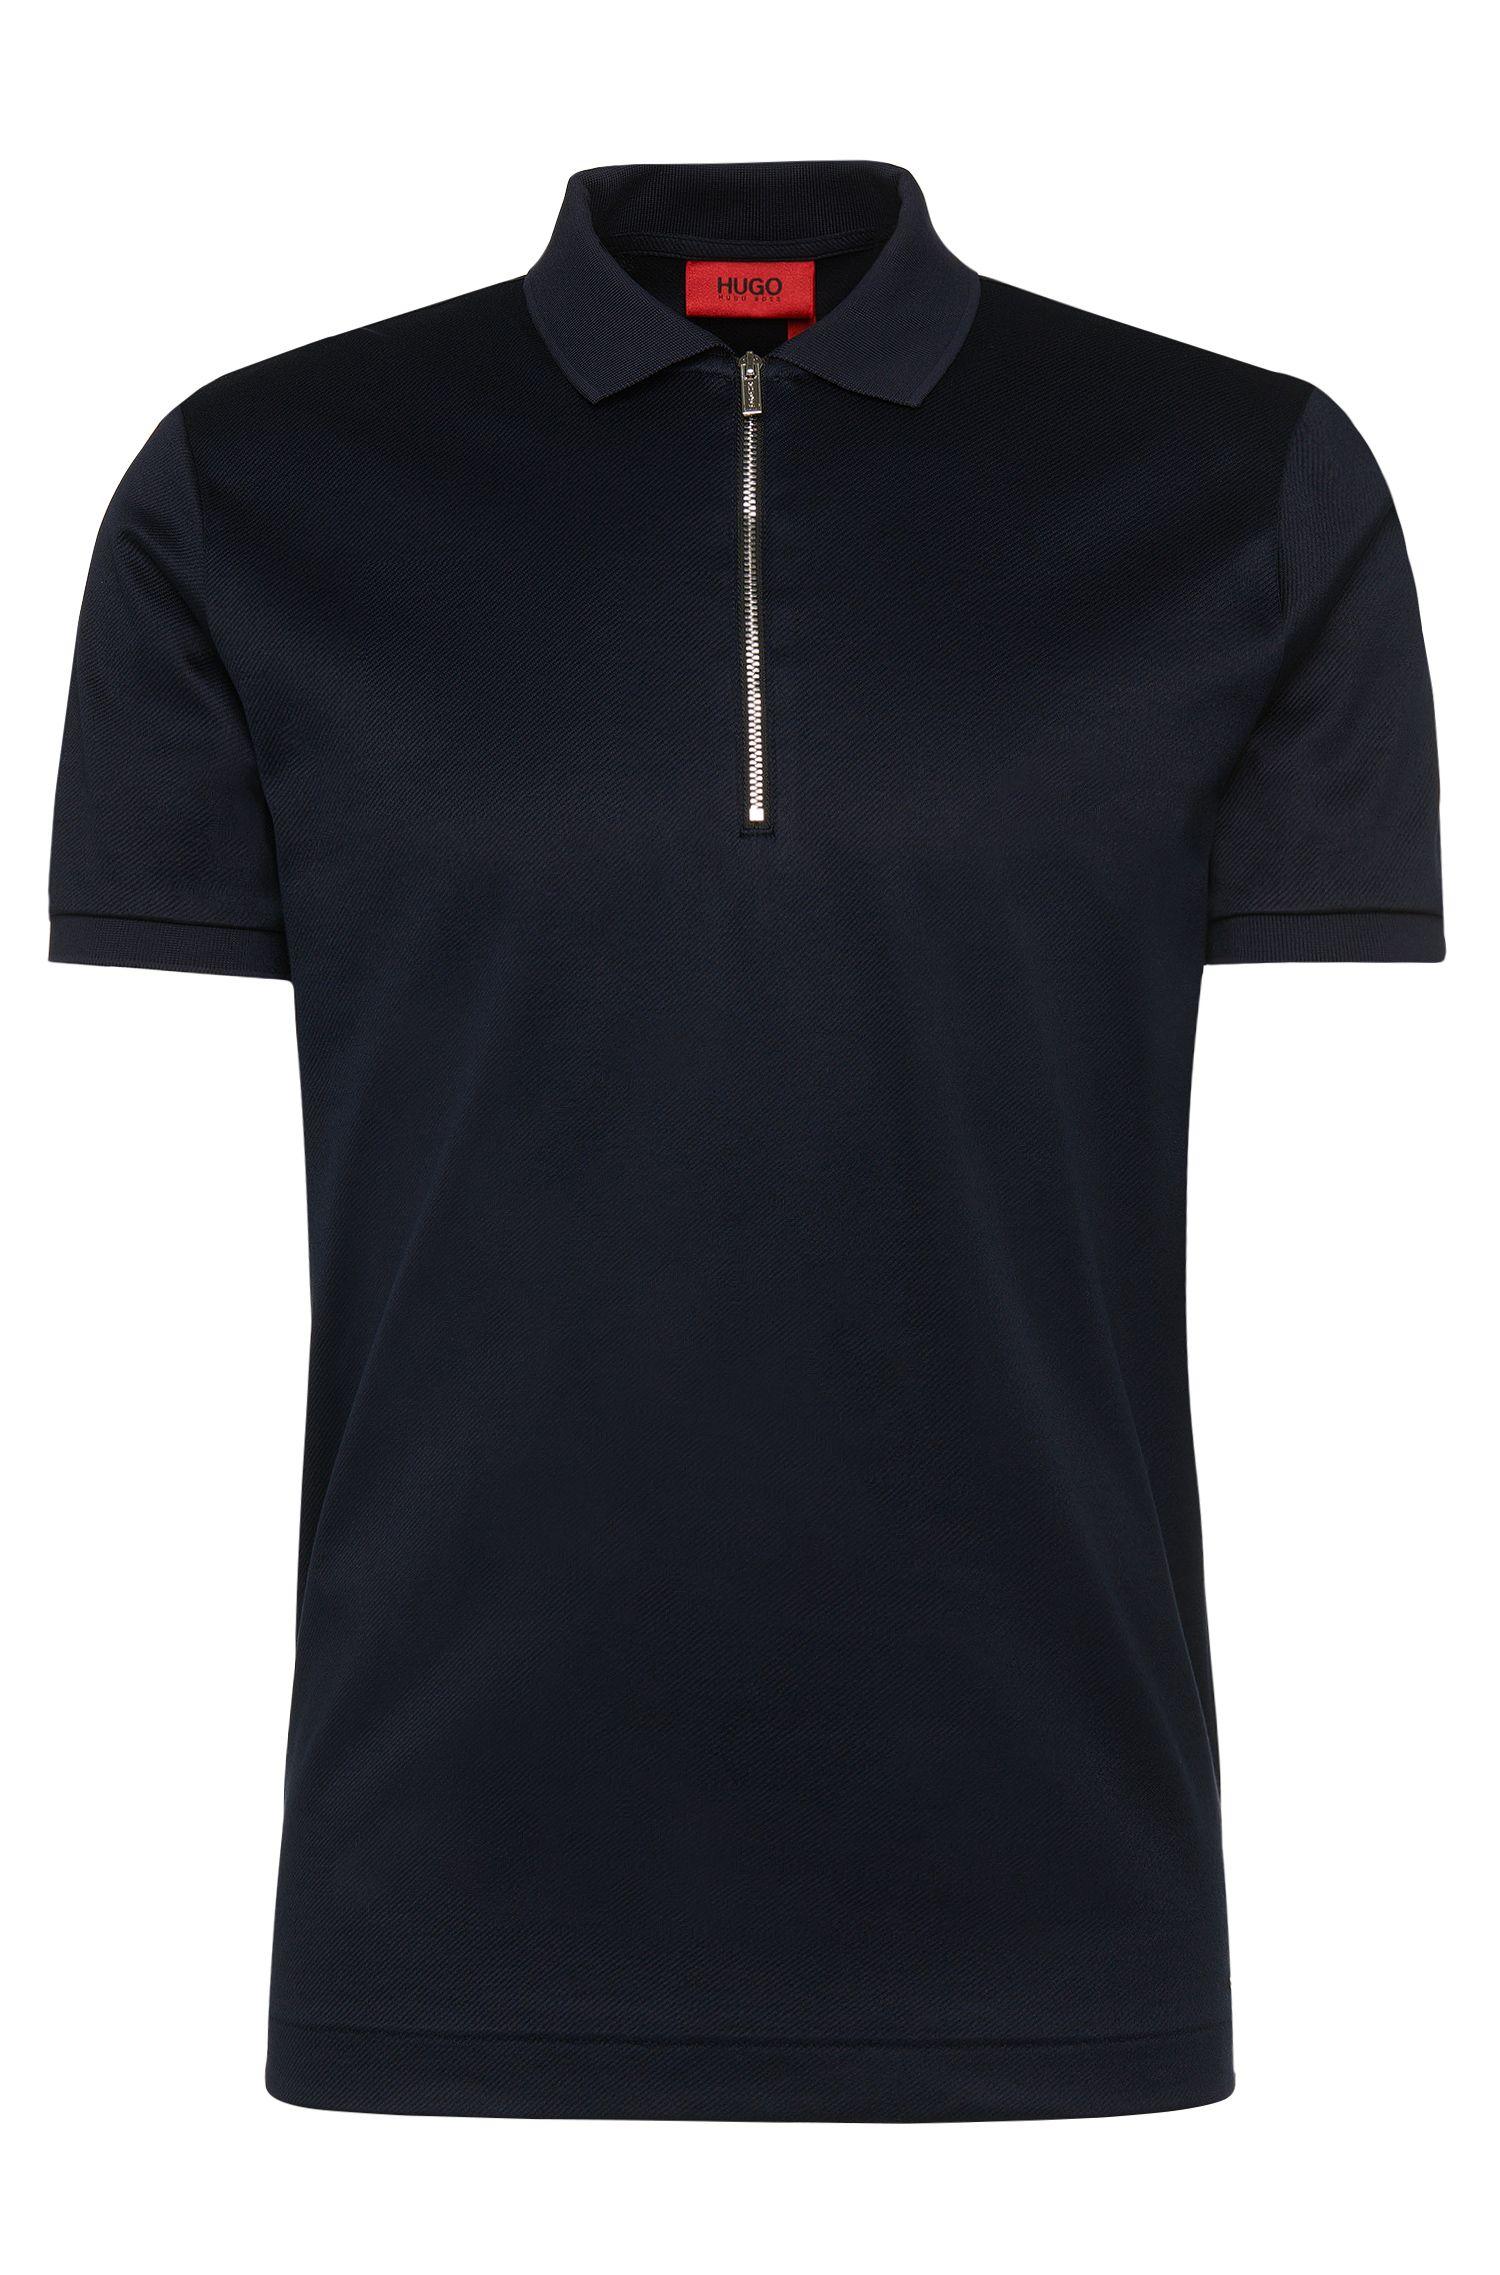 'Digato' | Regular Fit, Mercerized Cotton Twill Polo Shirt